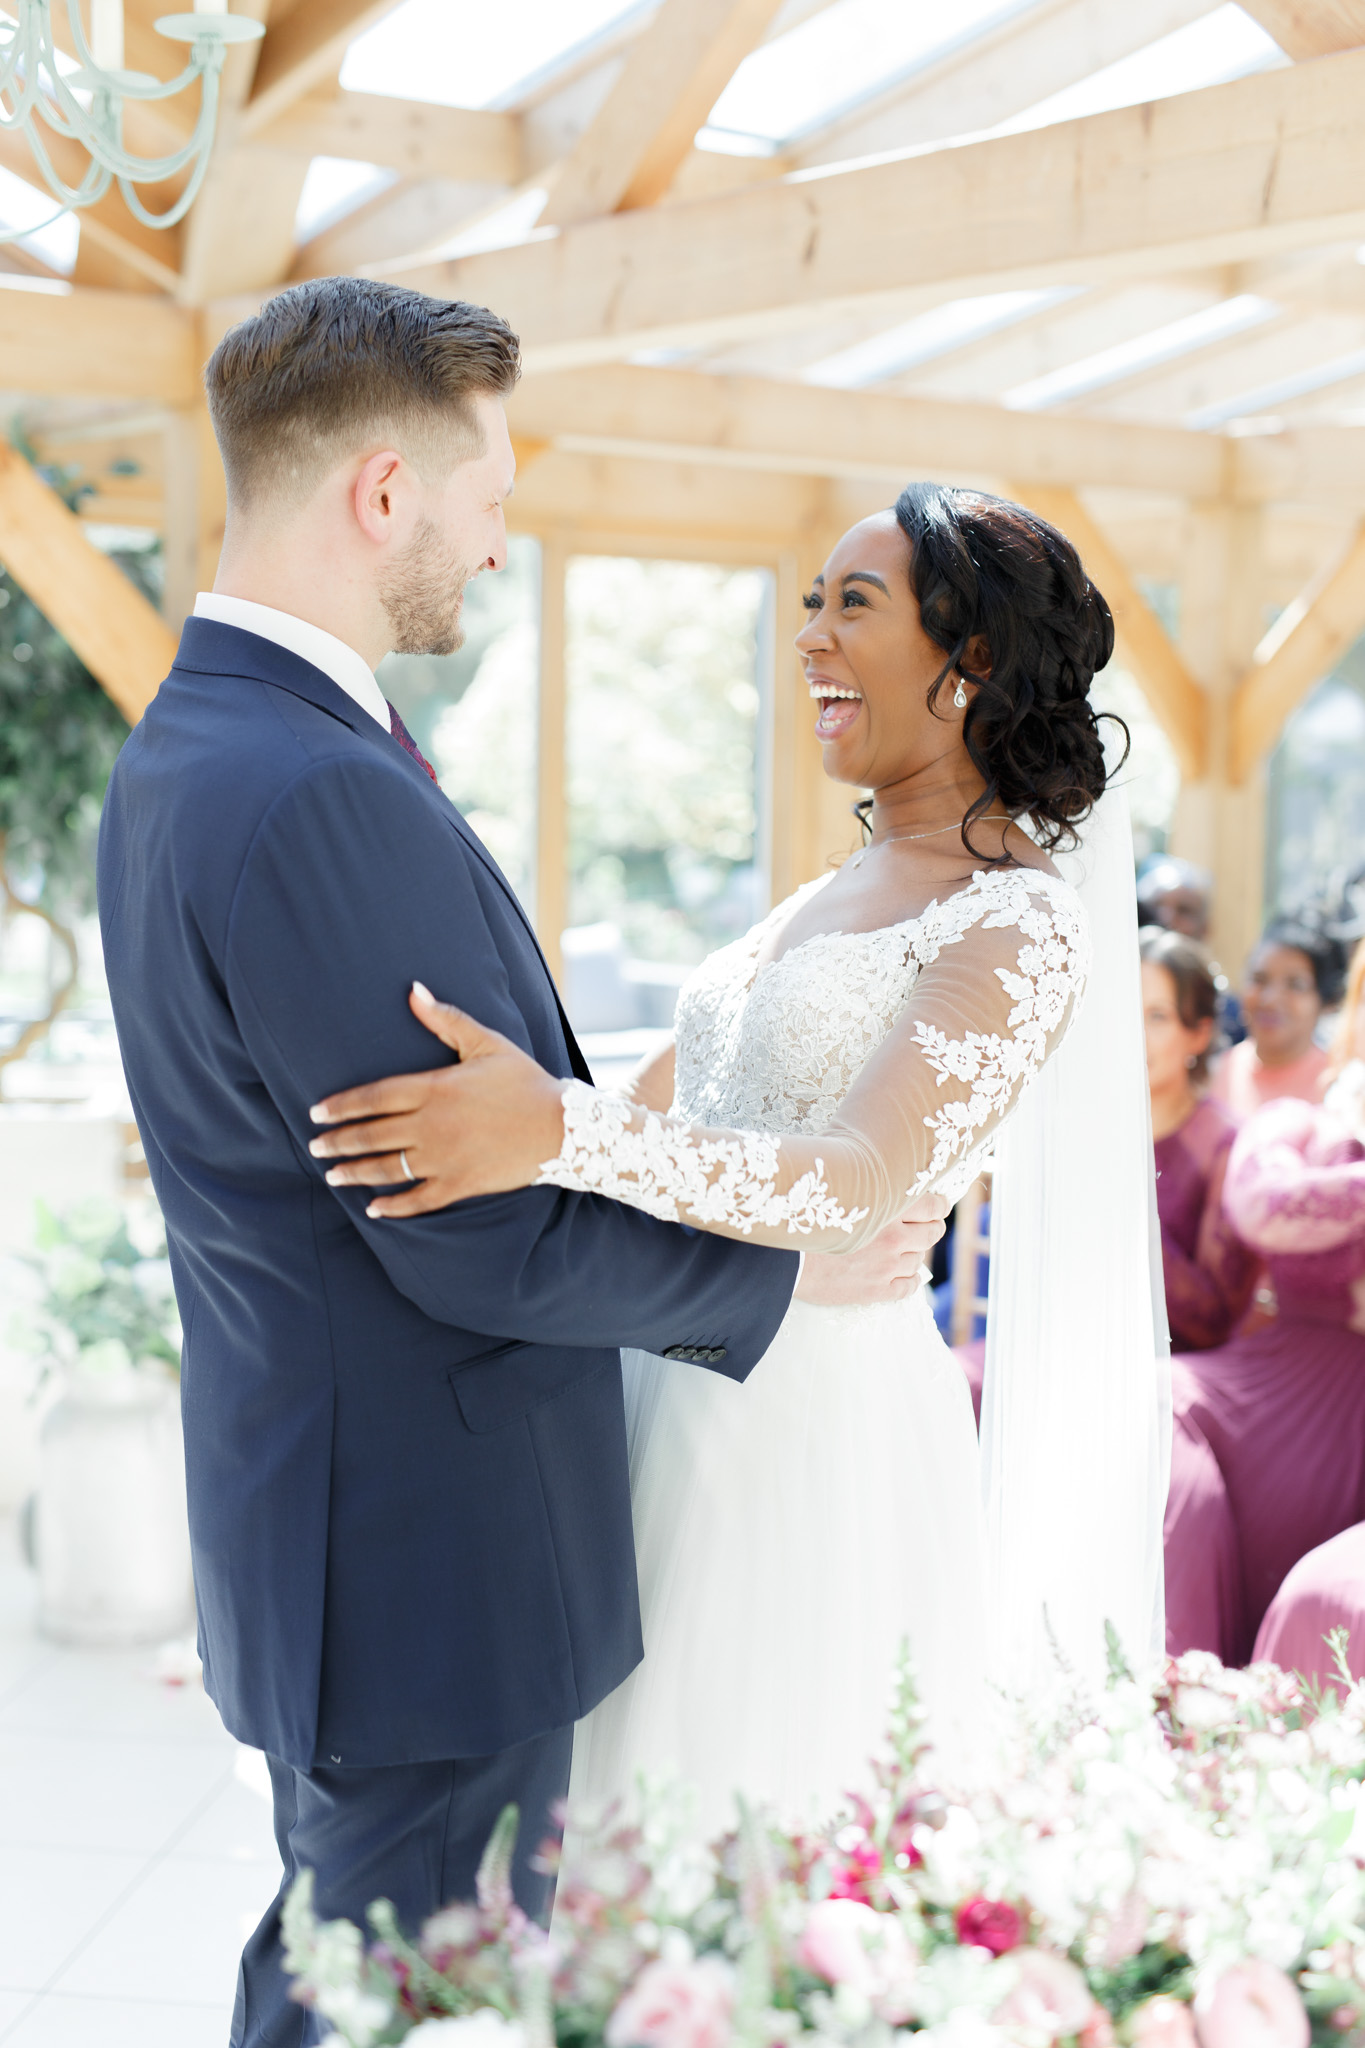 ryan thomas wedding ceremony bride and groom smiling